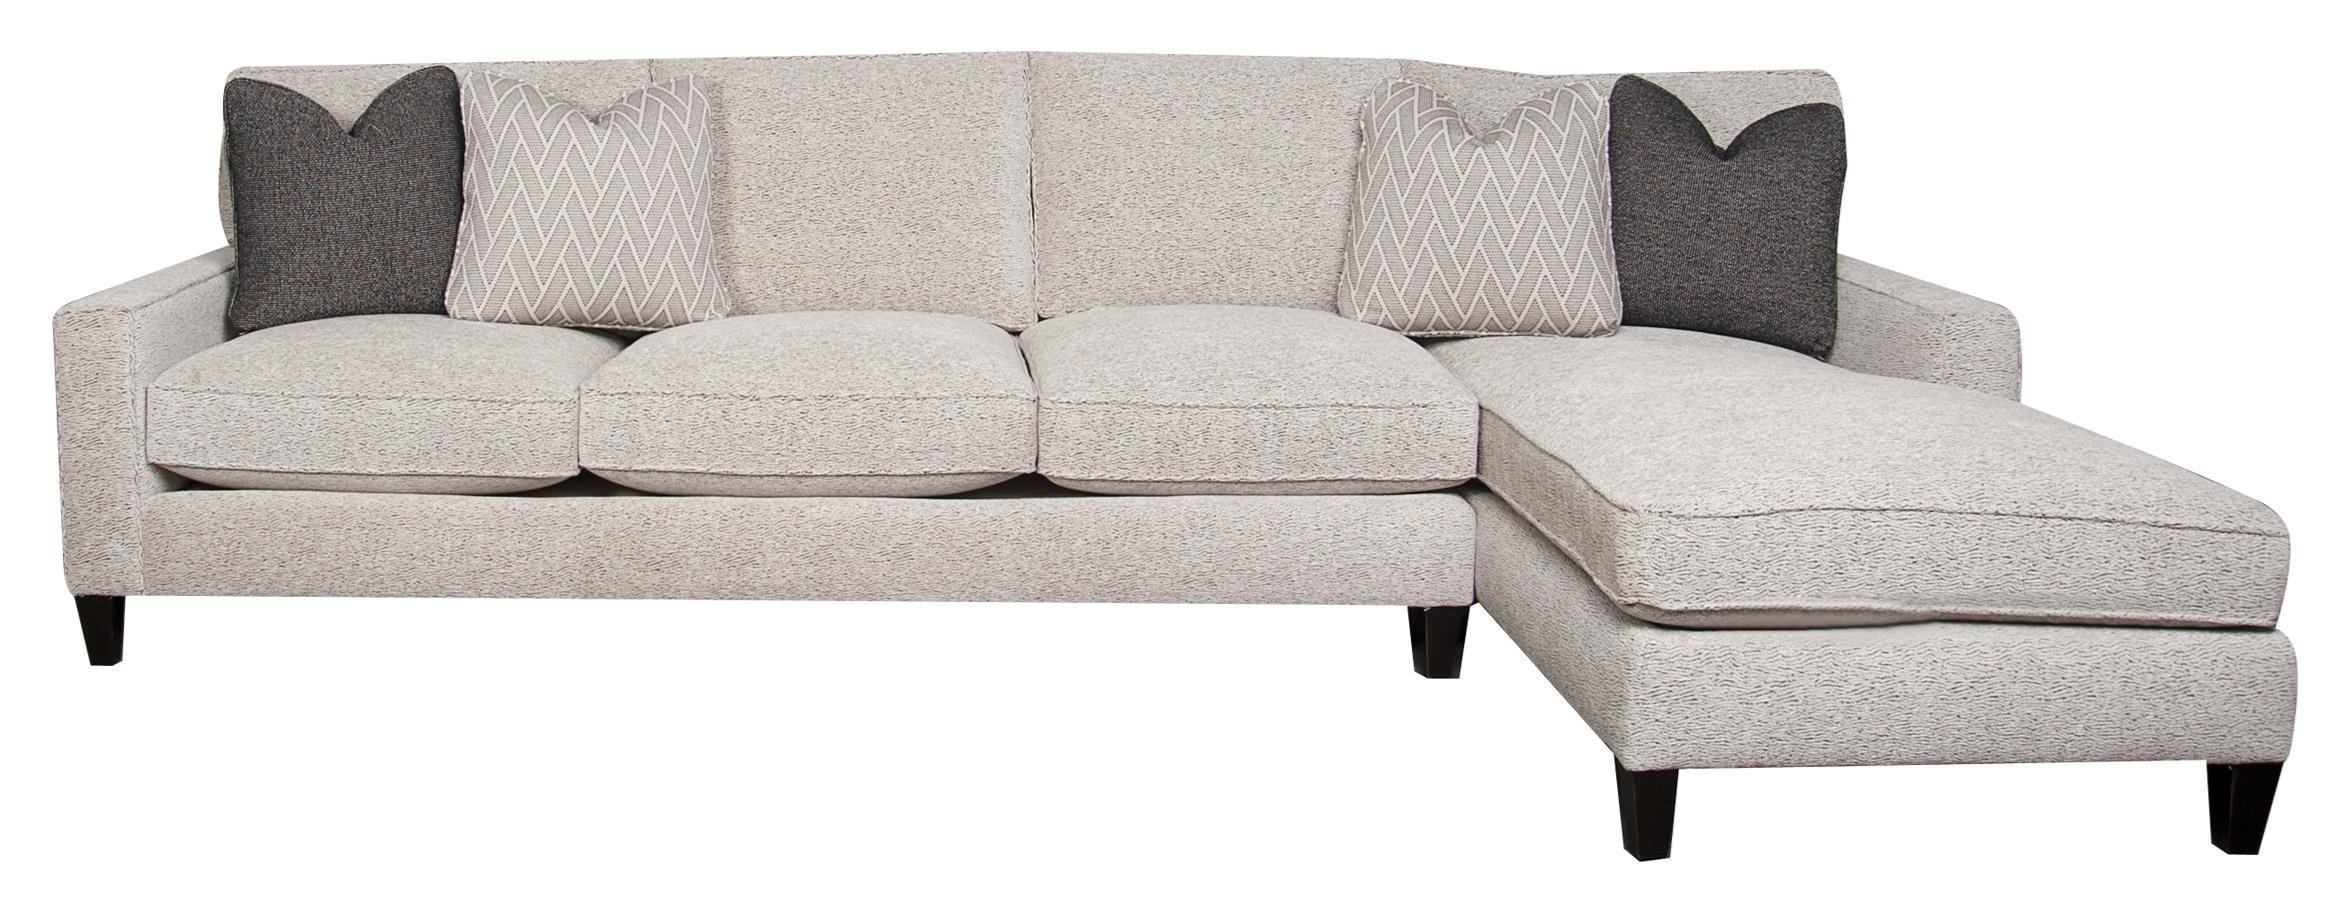 bernhardt cantor sectional sofa tables toronto germain modern plush